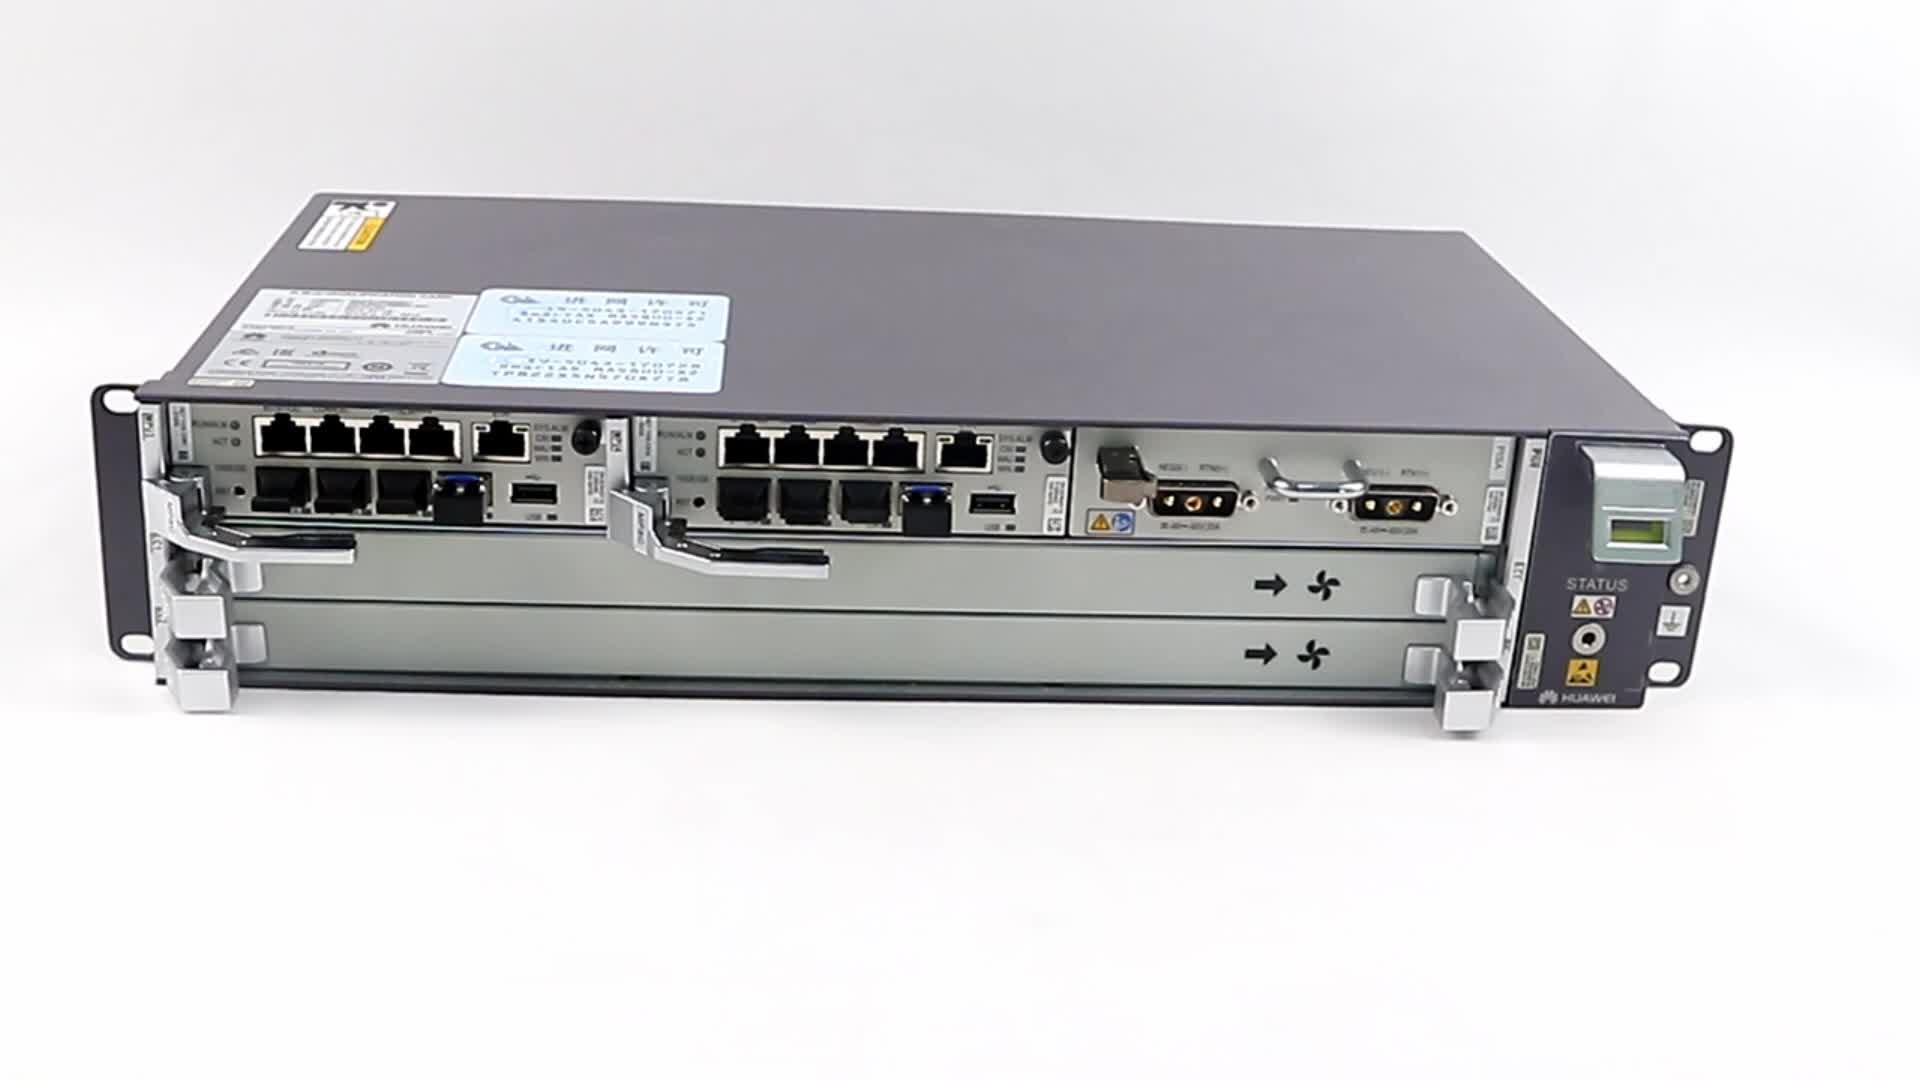 MA5800 X2 GPON/EPON OLT MPSC MPSB PISA PISB